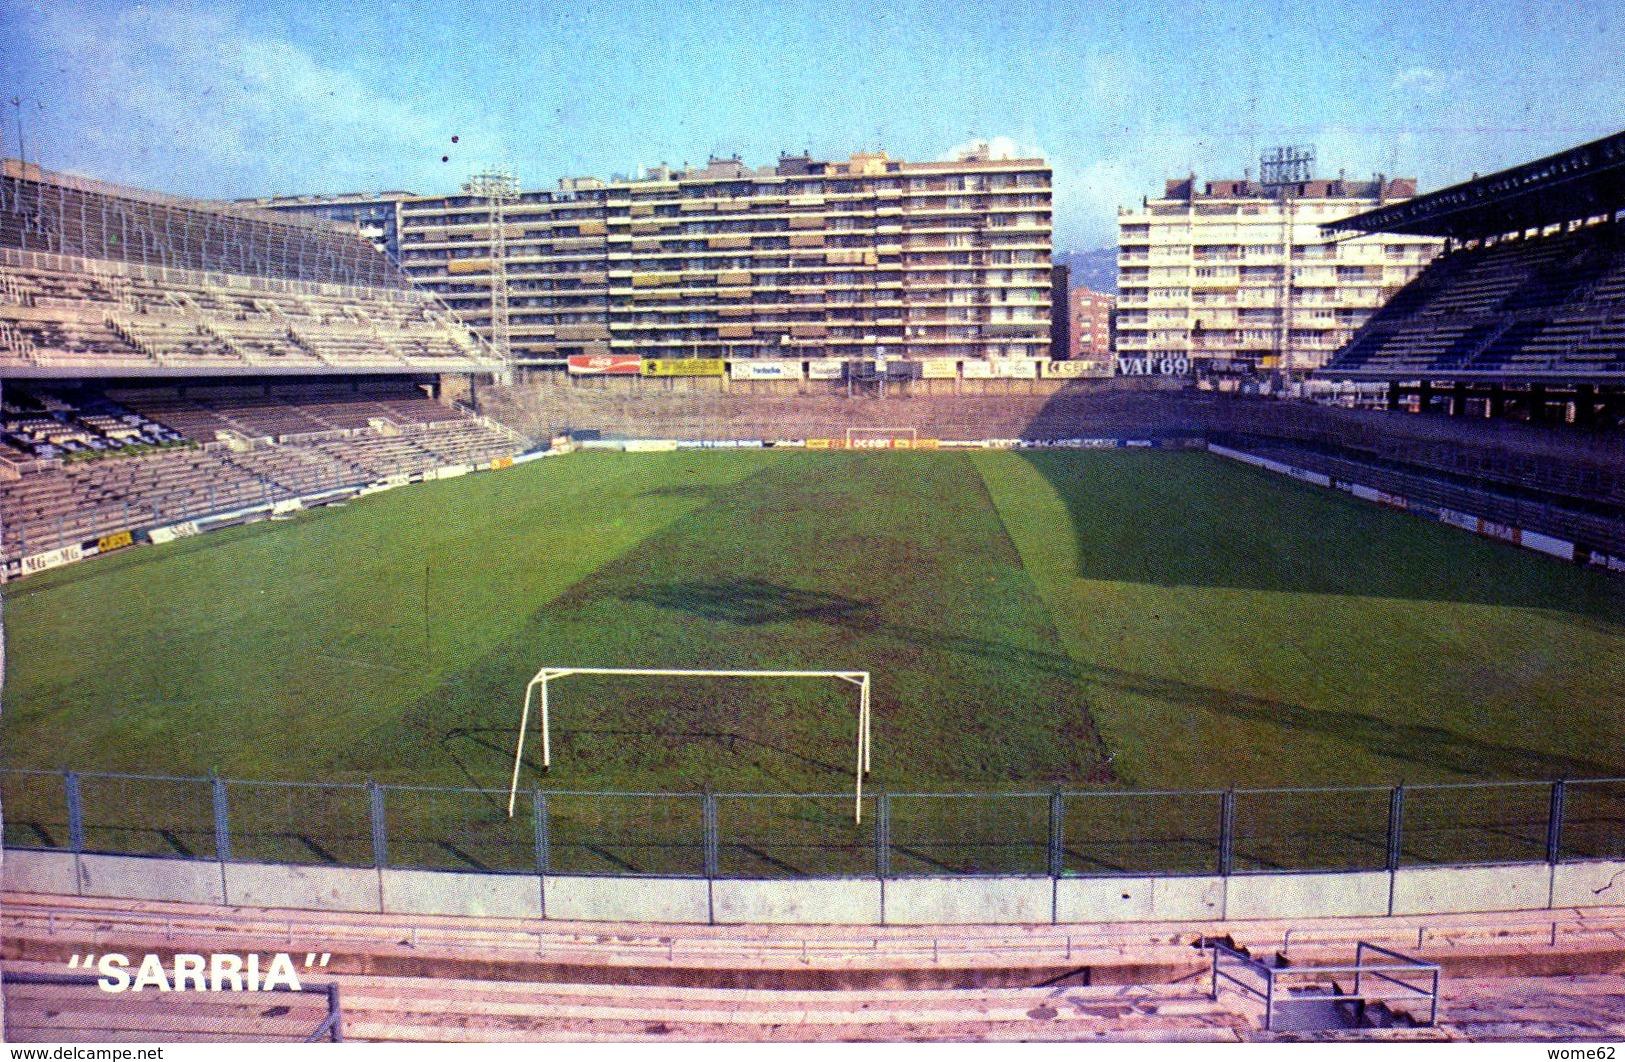 POSTAL ESTADIO - STADIUM POSTCARD - BARCELONA - SARRIA - WORLD CUP 1982 - Fútbol